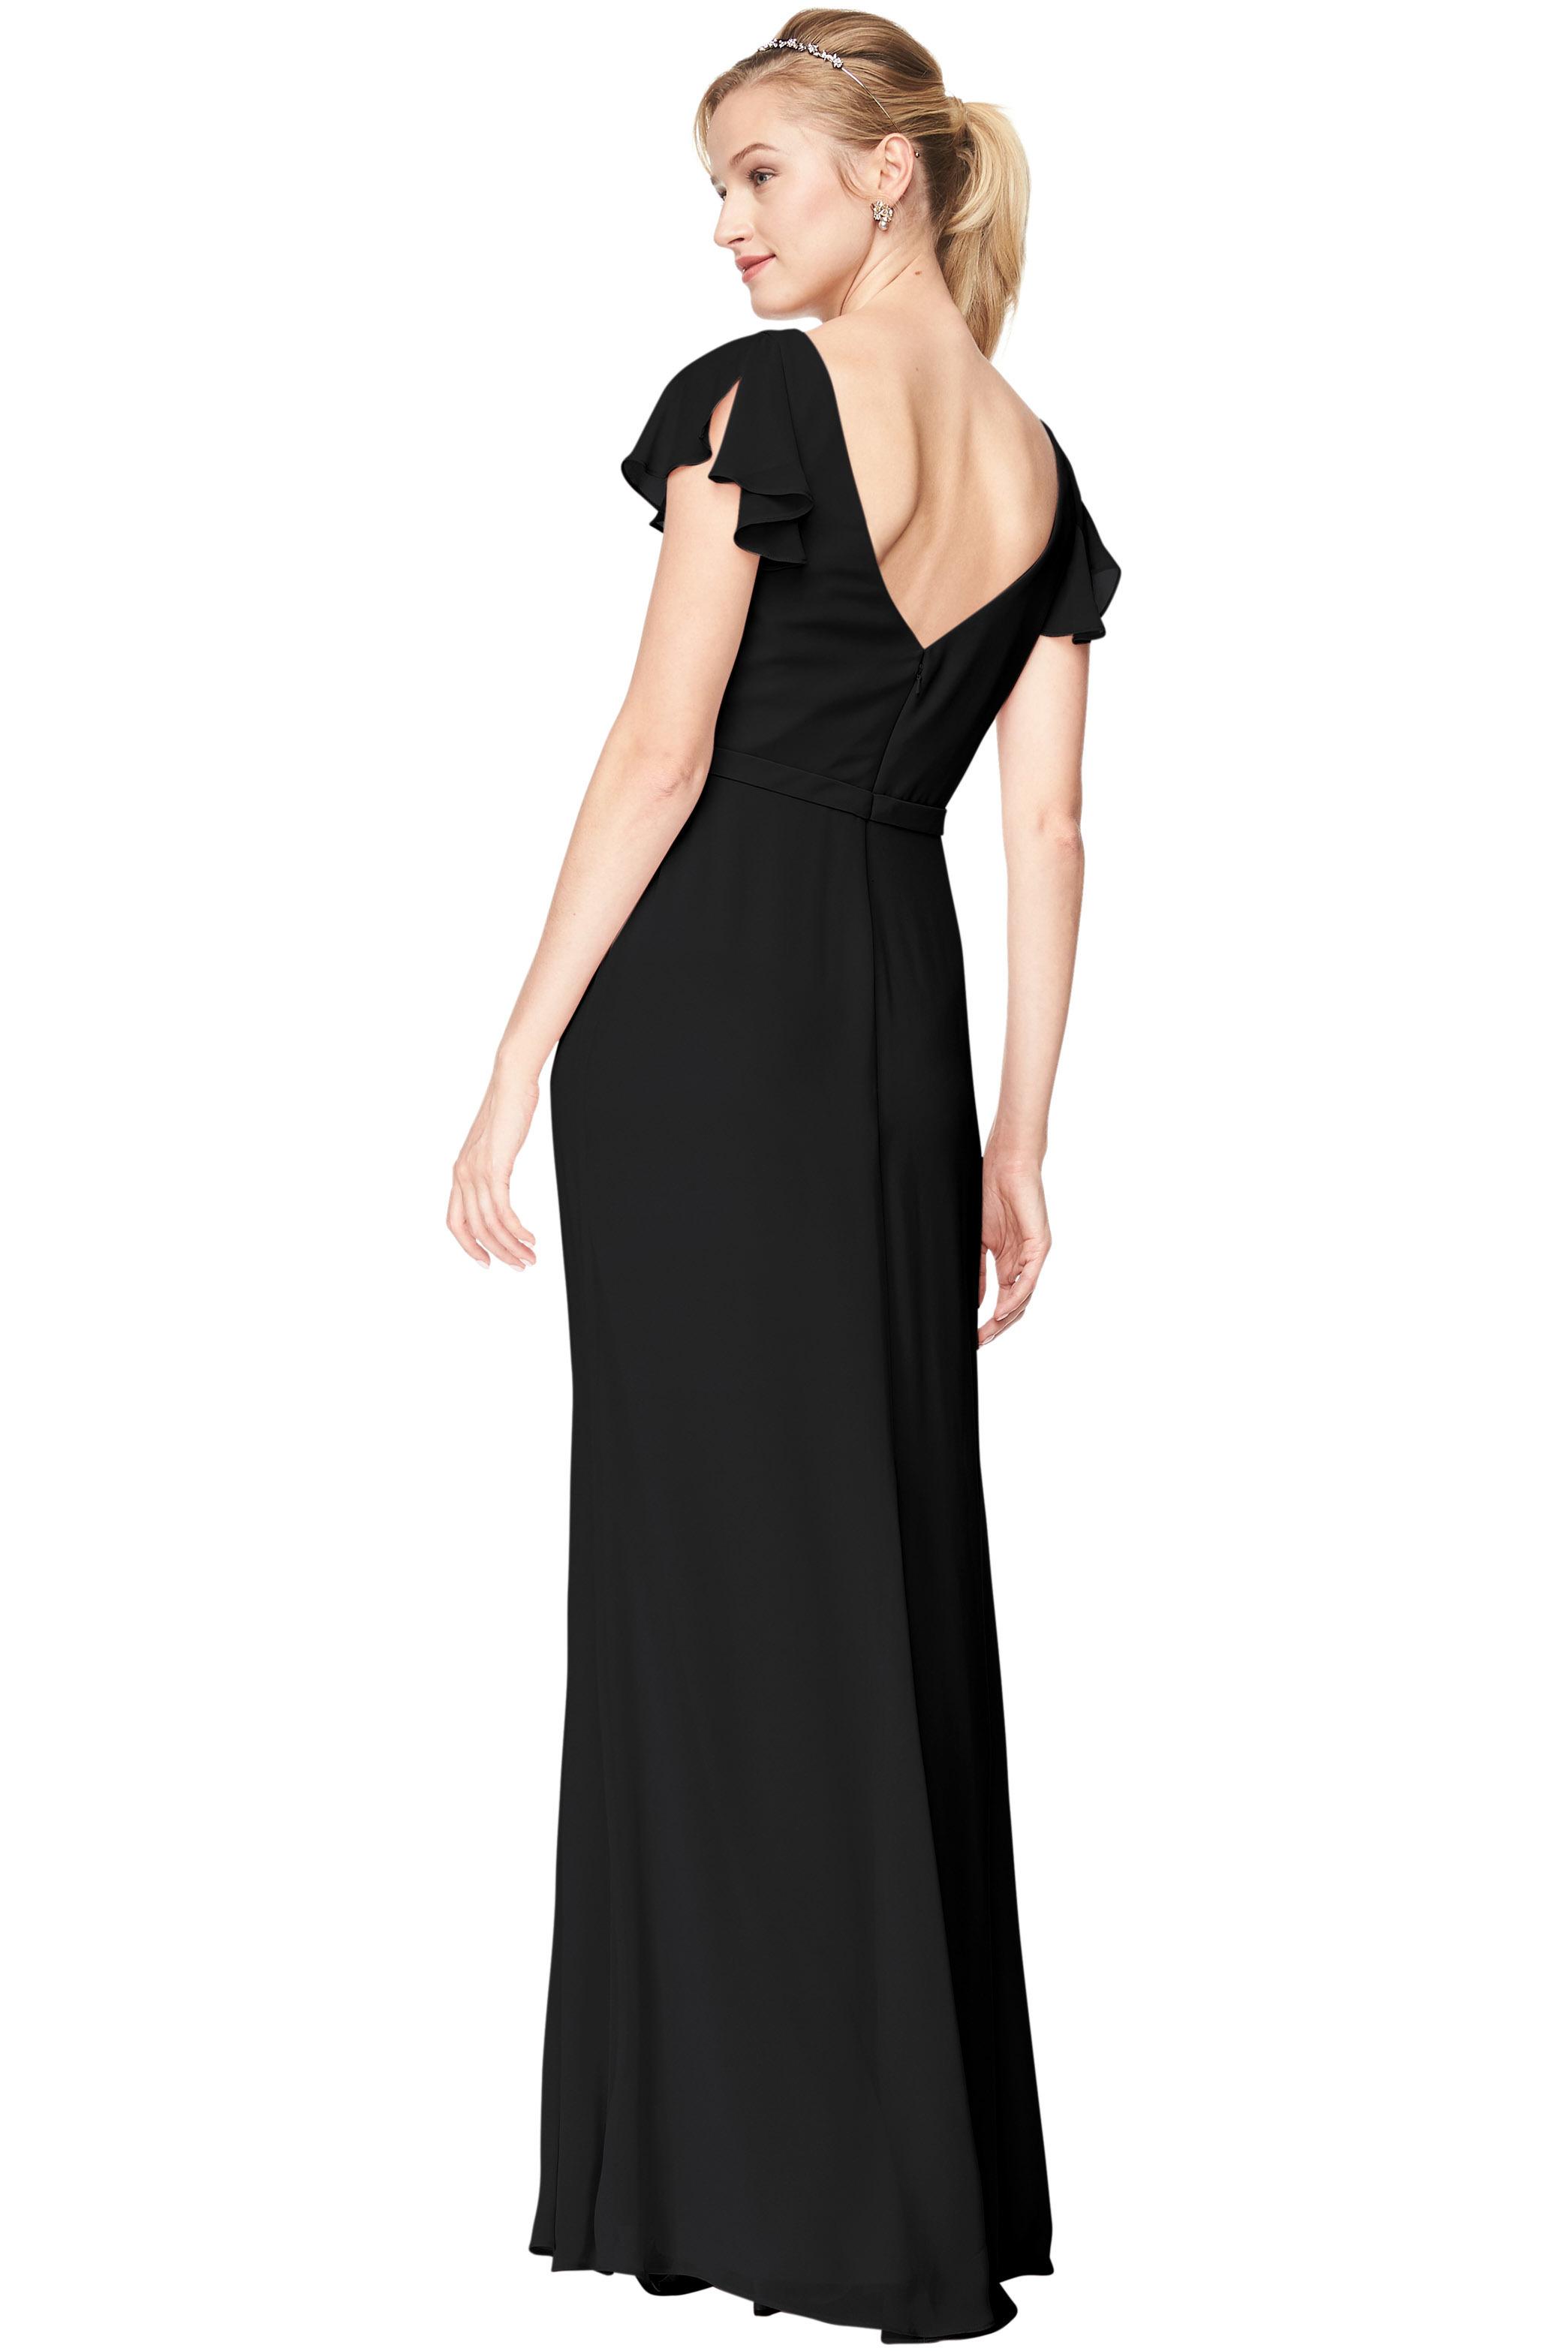 Bill Levkoff BLACK Chiffon V-Neck A-Line gown, $184.00 Back